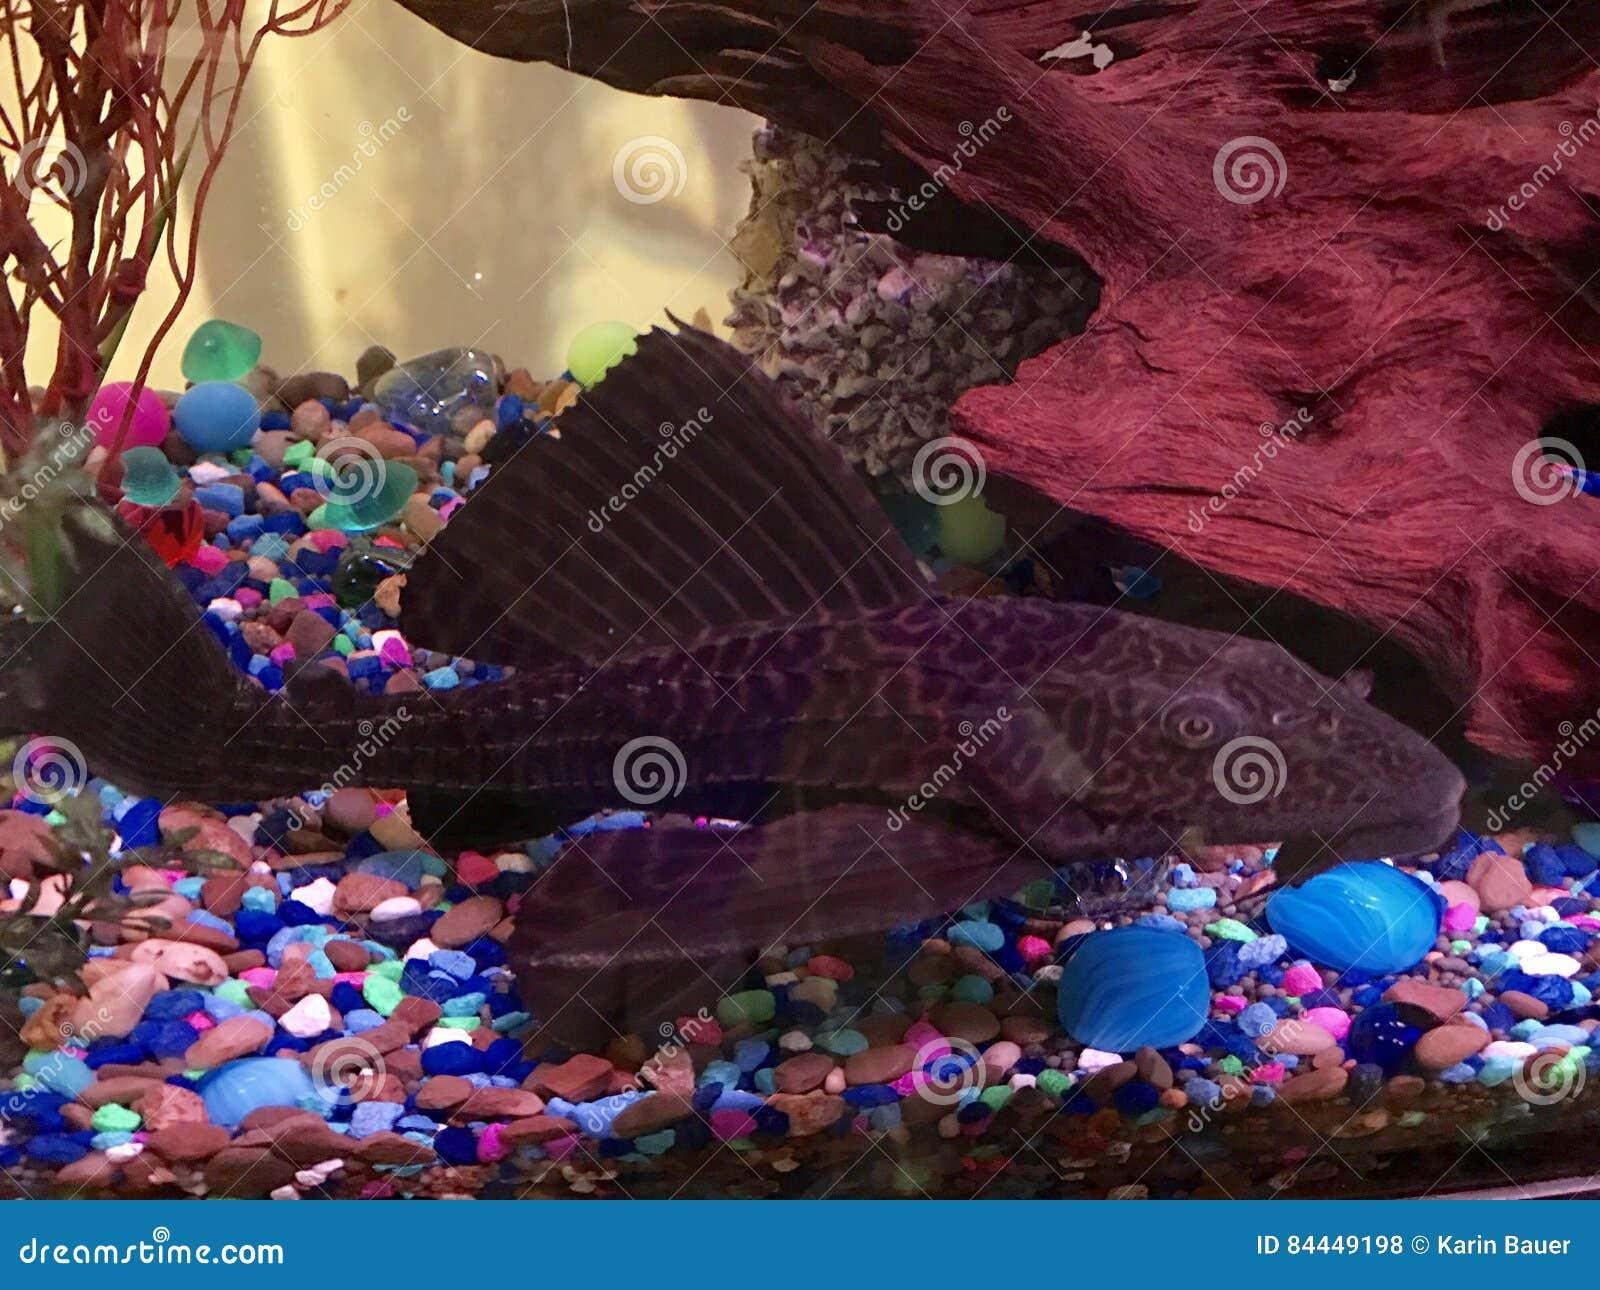 Plecostomous taking a rest in the tank